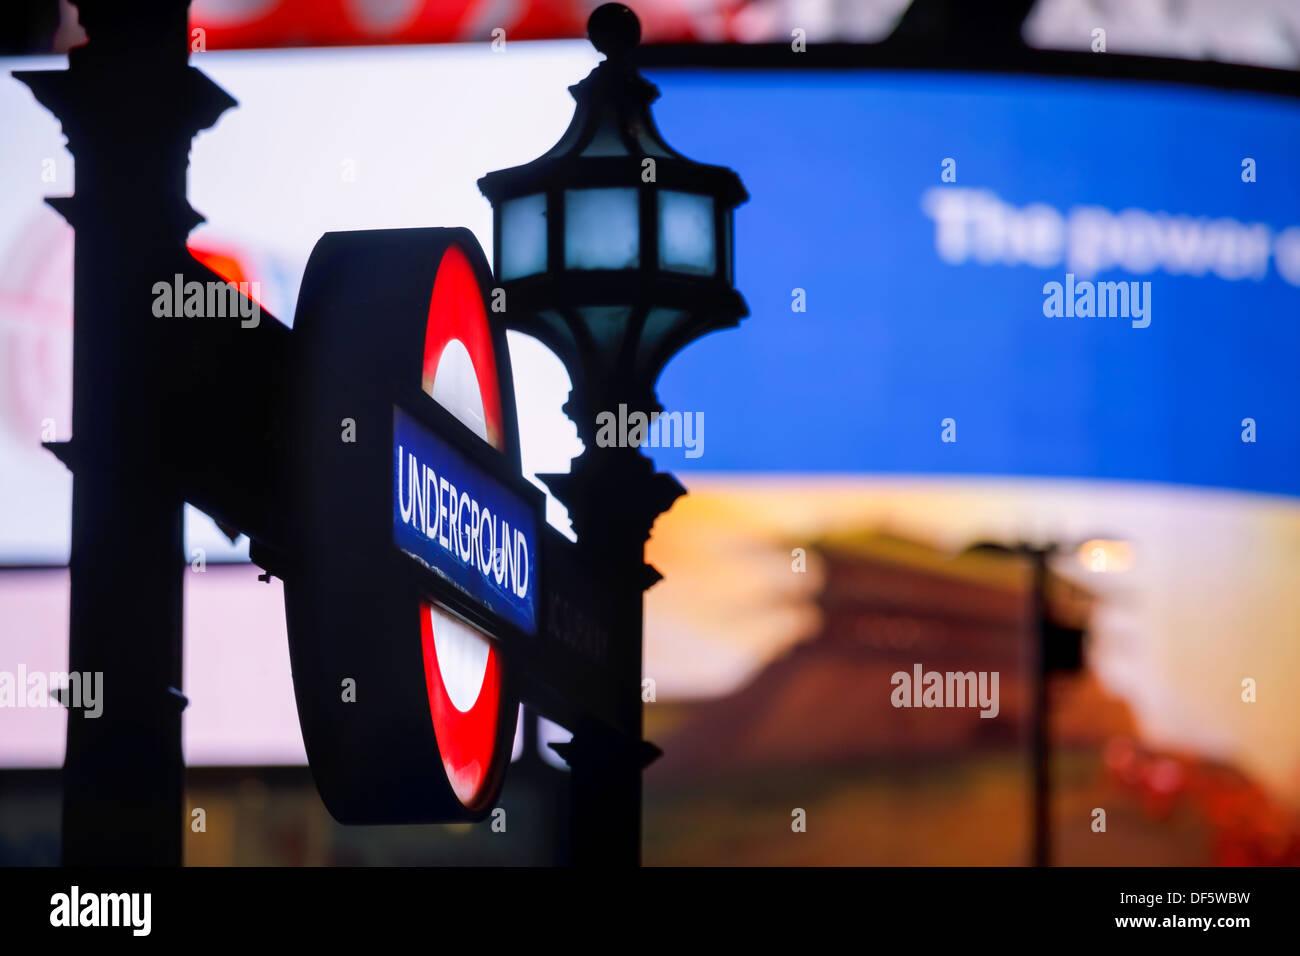 Underground Piccadilly Circus London England - Stock Image